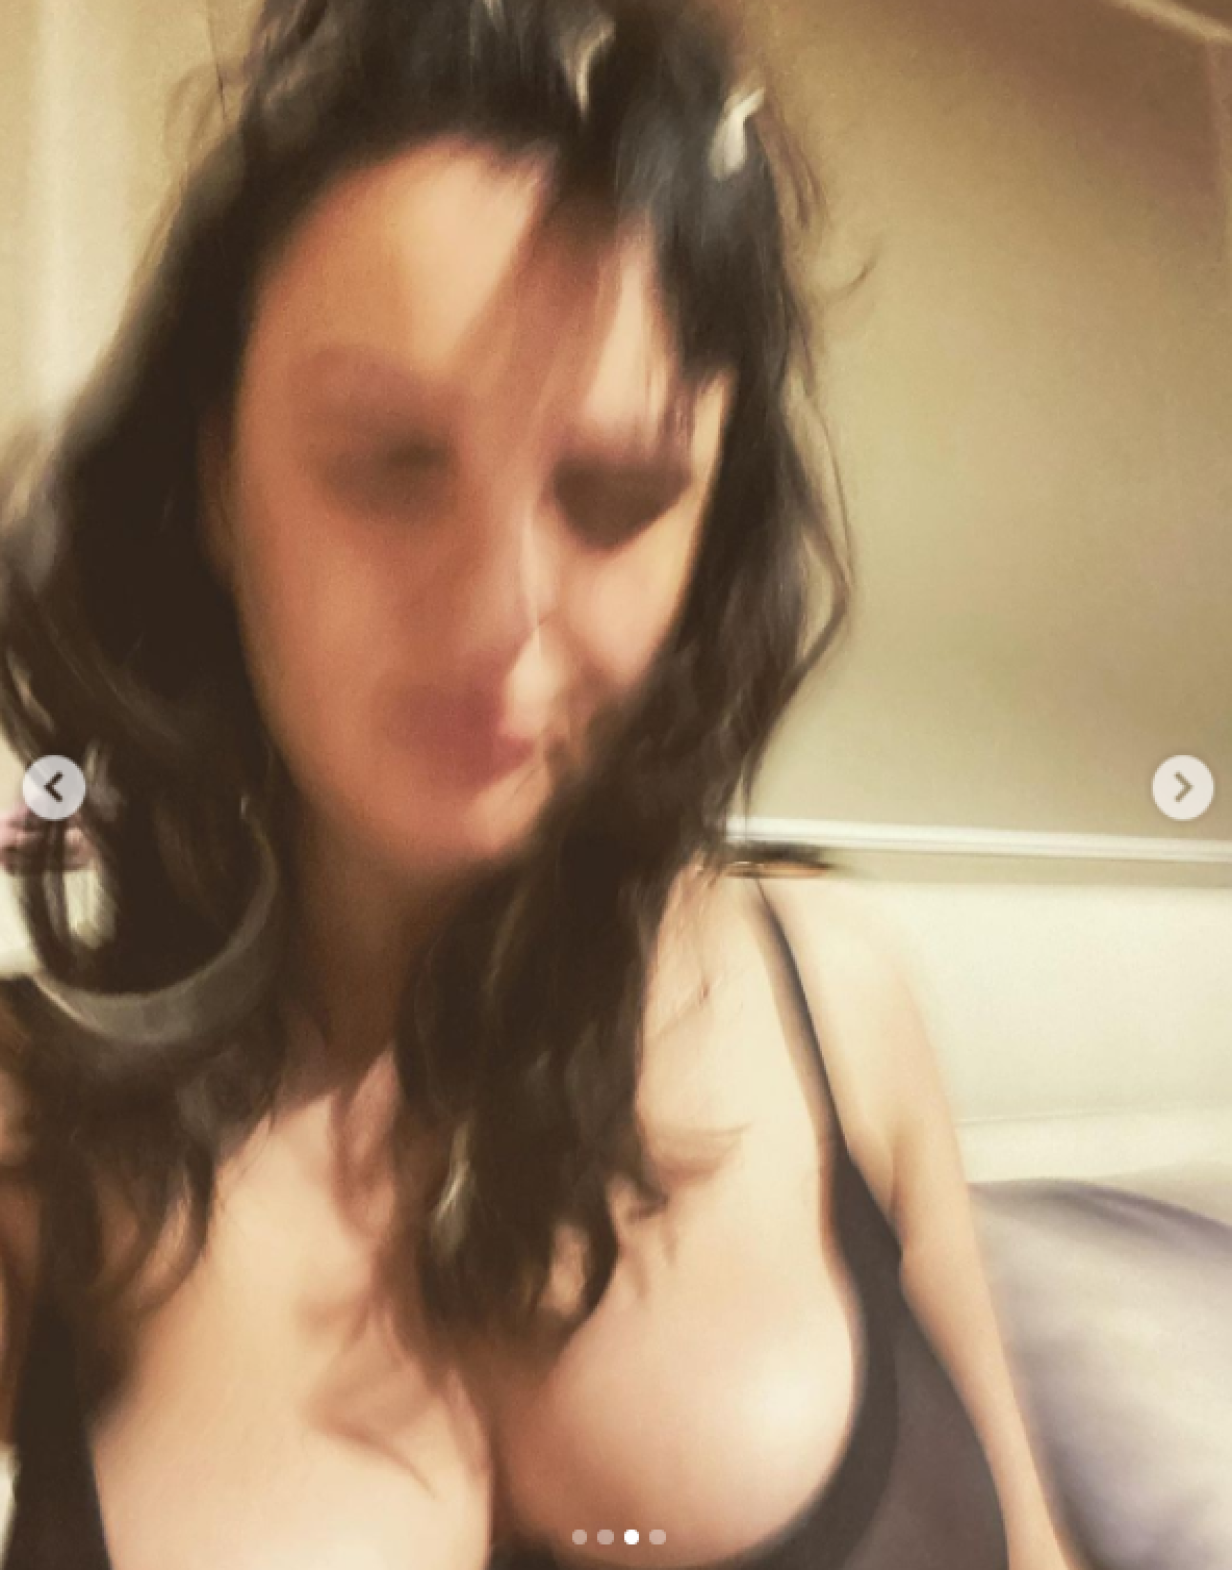 arisa foto instagram fisico reggiseno